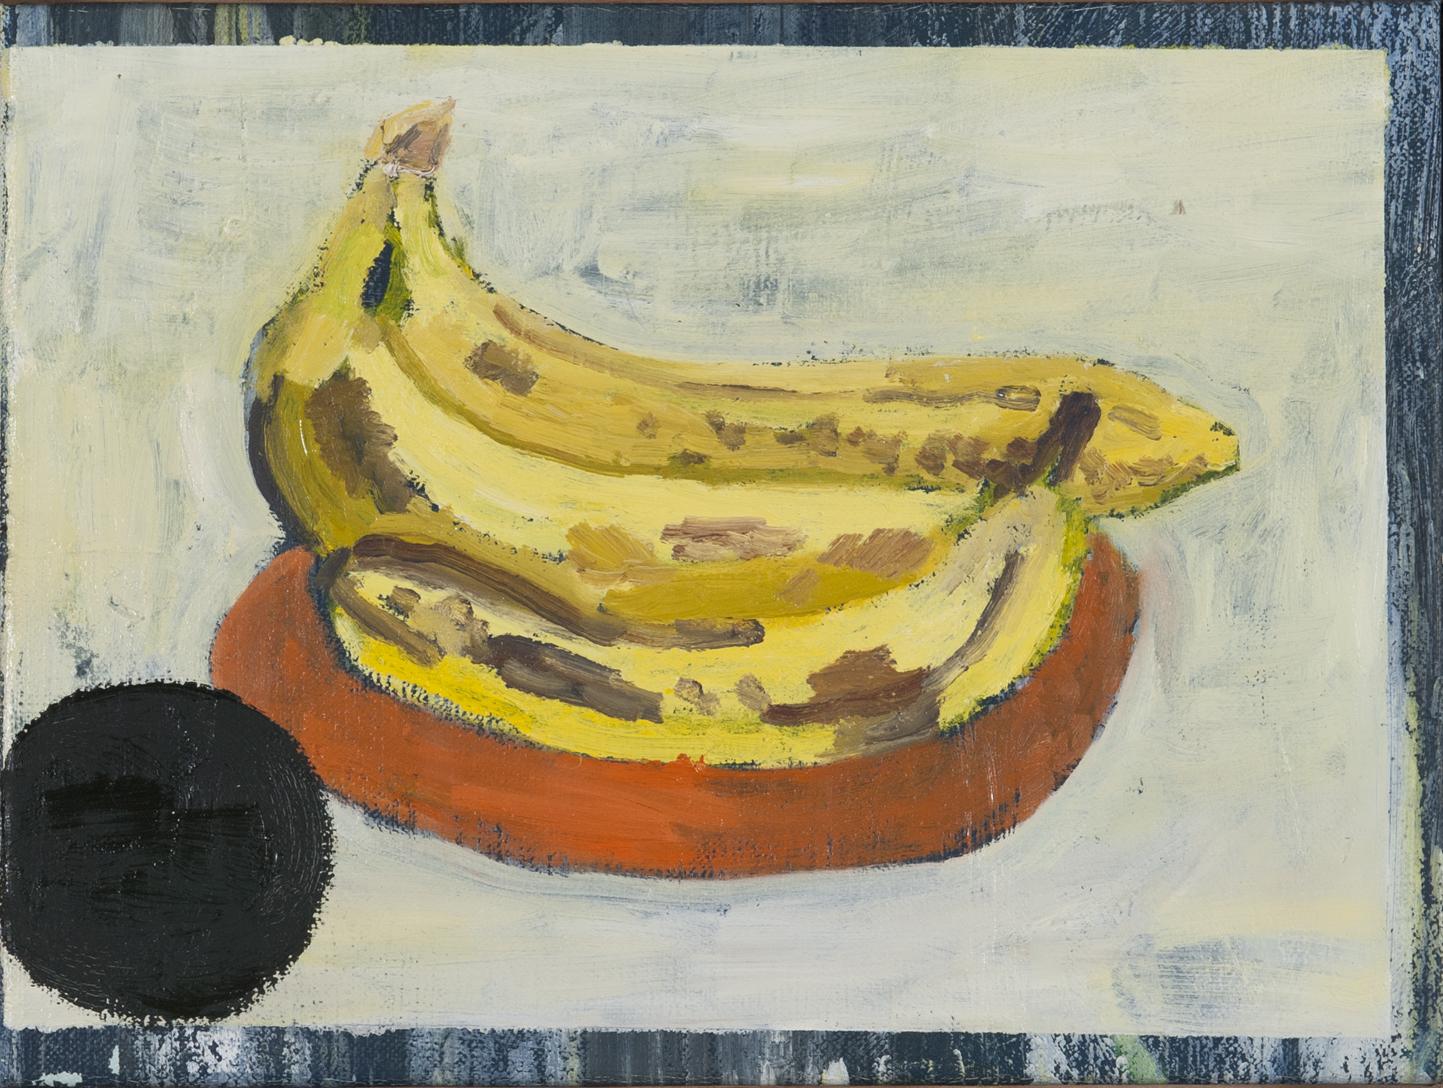 NICK COLLERSON  Bananas , 2016 oil on linen 27.5 x 37 cm